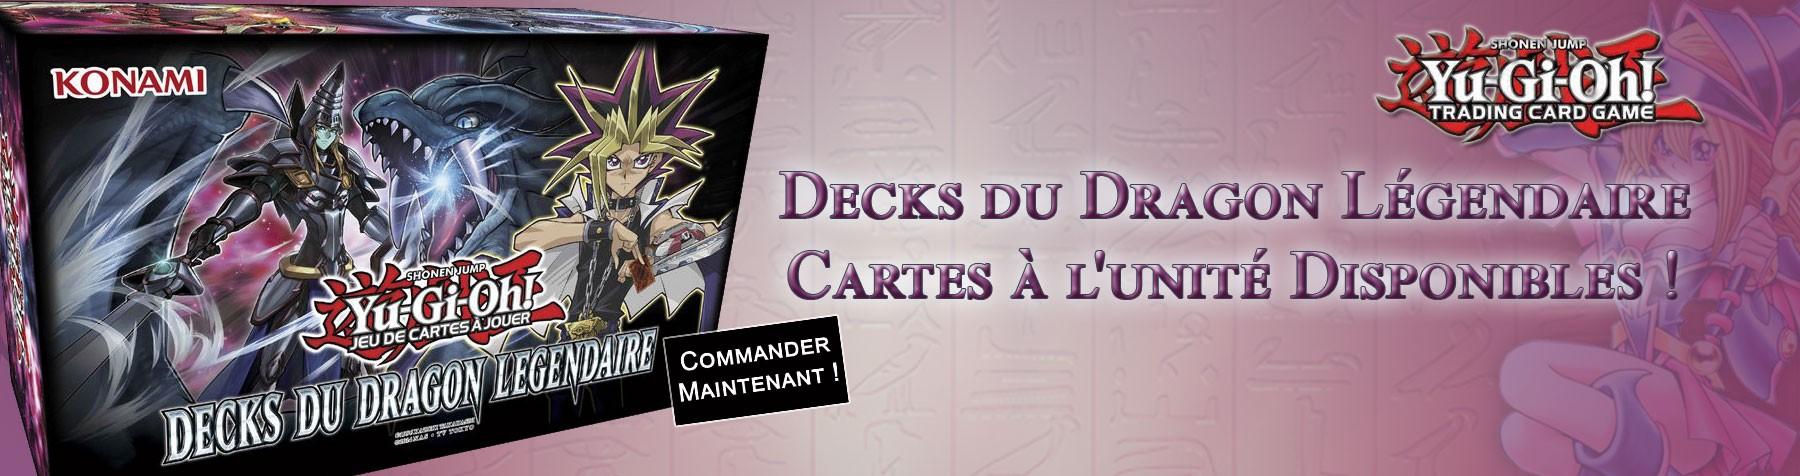 Yu-Gi-Oh! Decks du Dragon Légendaire